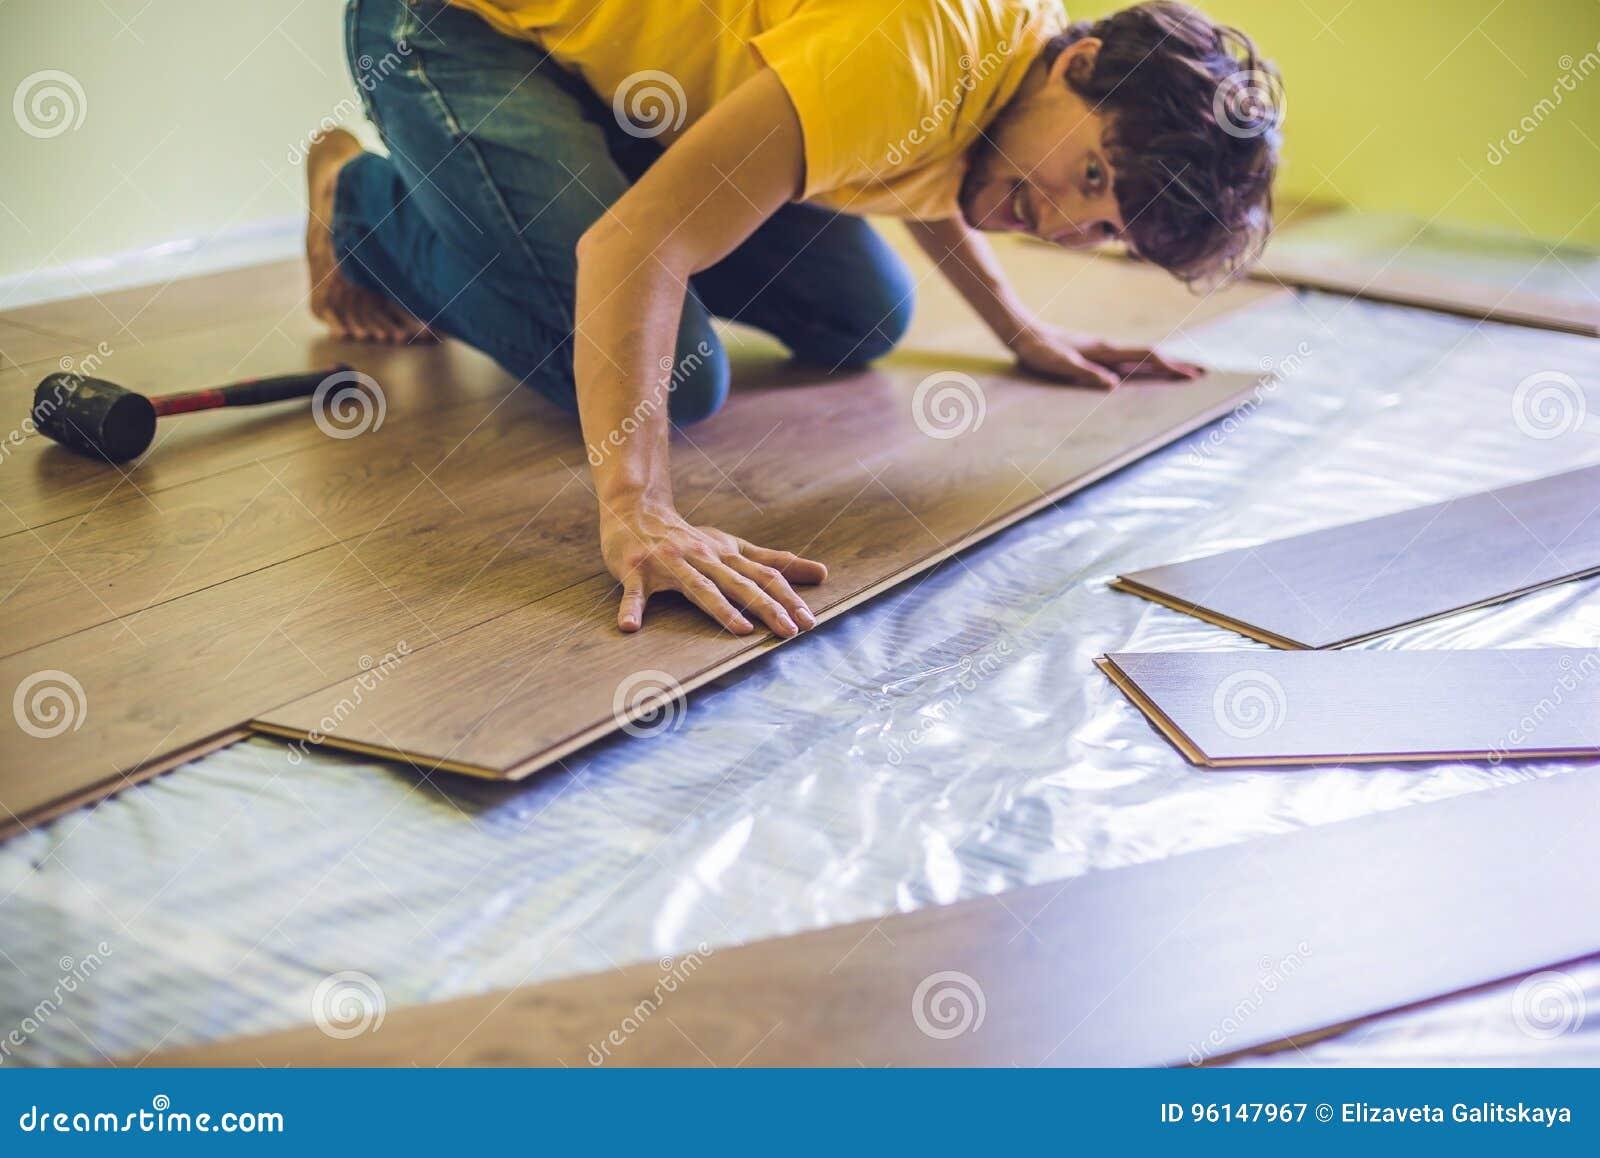 Man installing new wooden laminate flooring. infrared floor heat